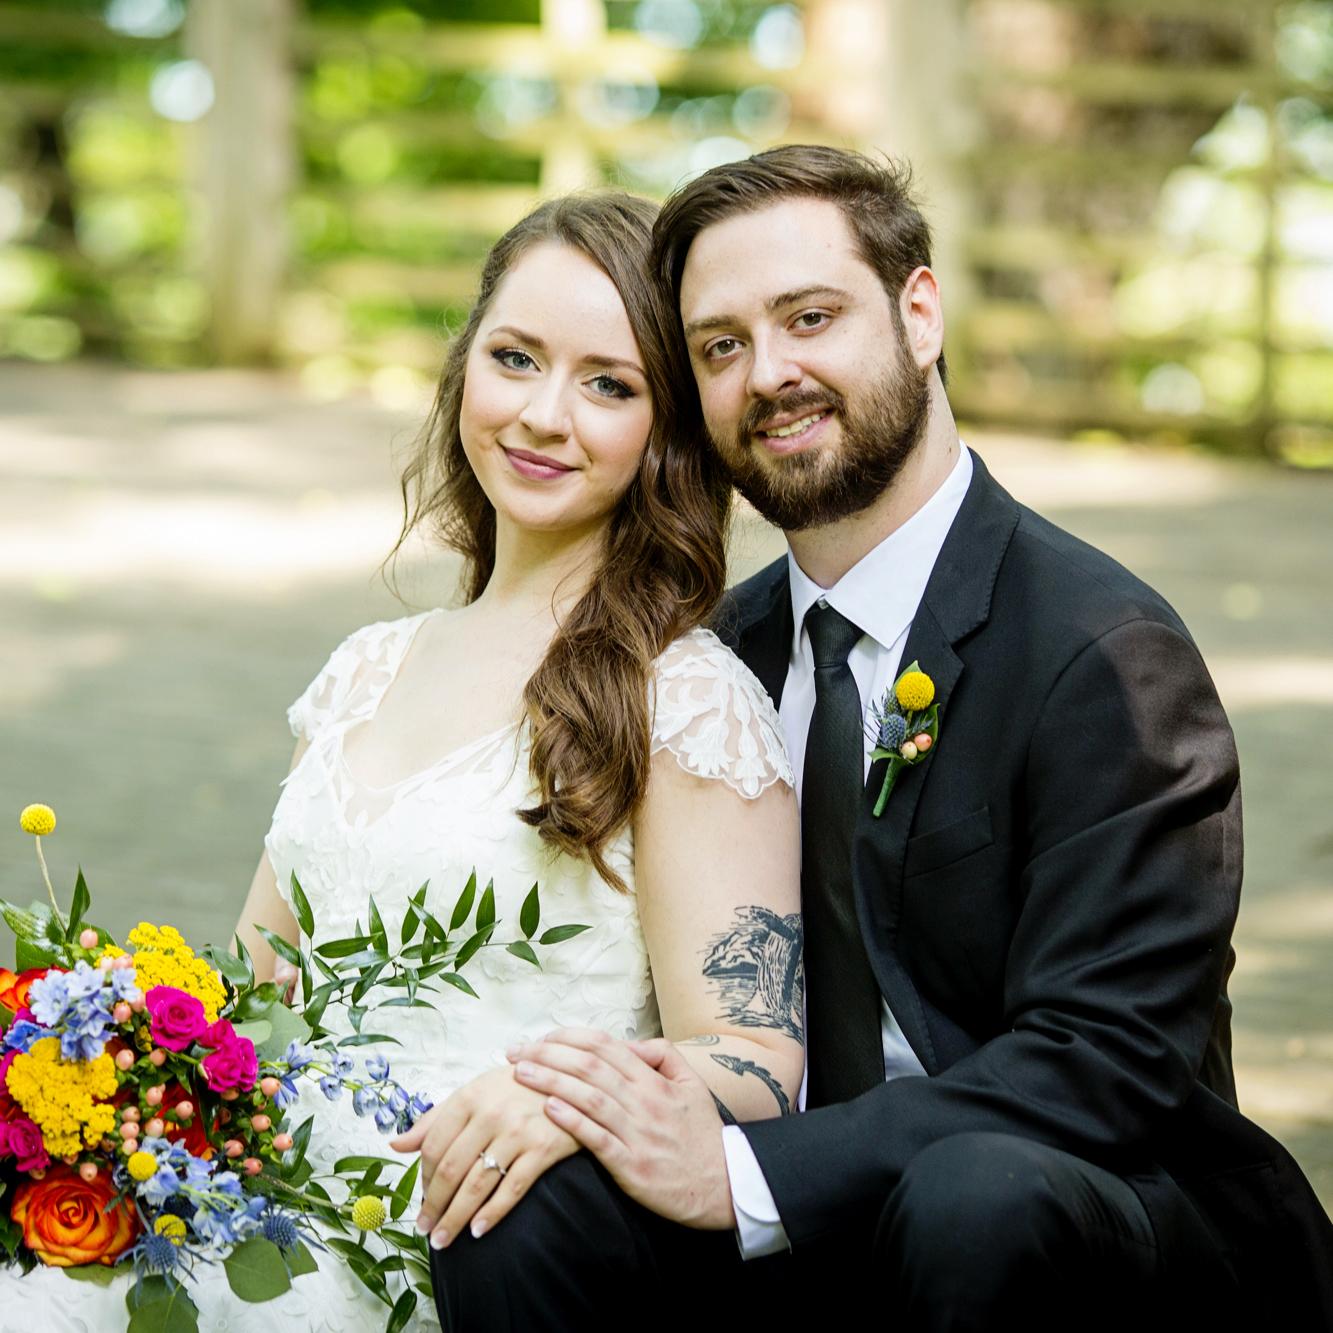 Seriously_Sabrina_Photography_Milwaukee_Wisconsin_Wedding_Schlitz_Audubon_Nature_Center_BrunderRife53.jpg